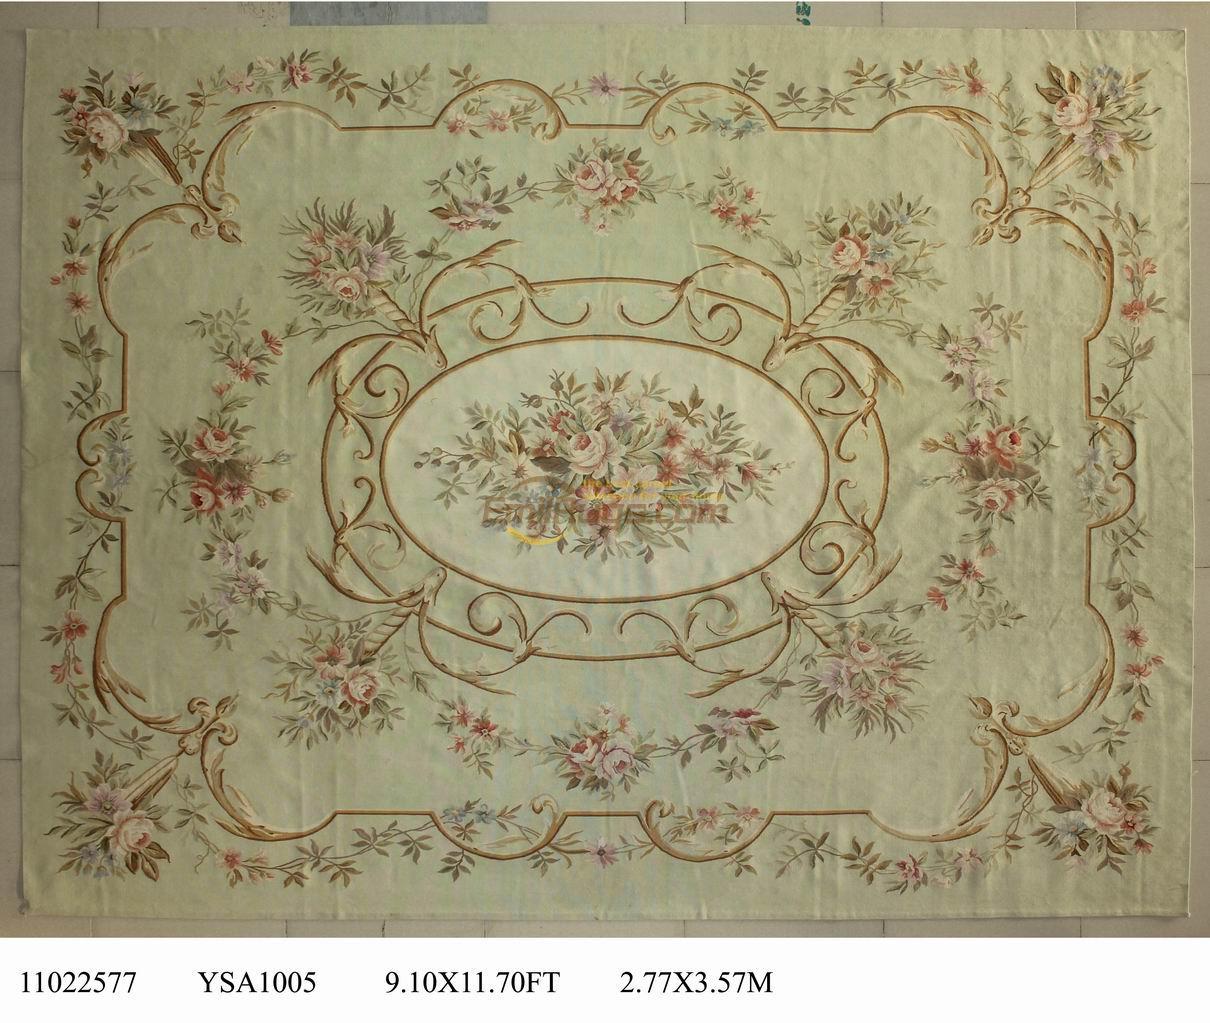 pure hand woven wool carpet french aubusson rugs in 277cmx357cm 91u0027x 117u0027 greenarea - Aubusson Rugs